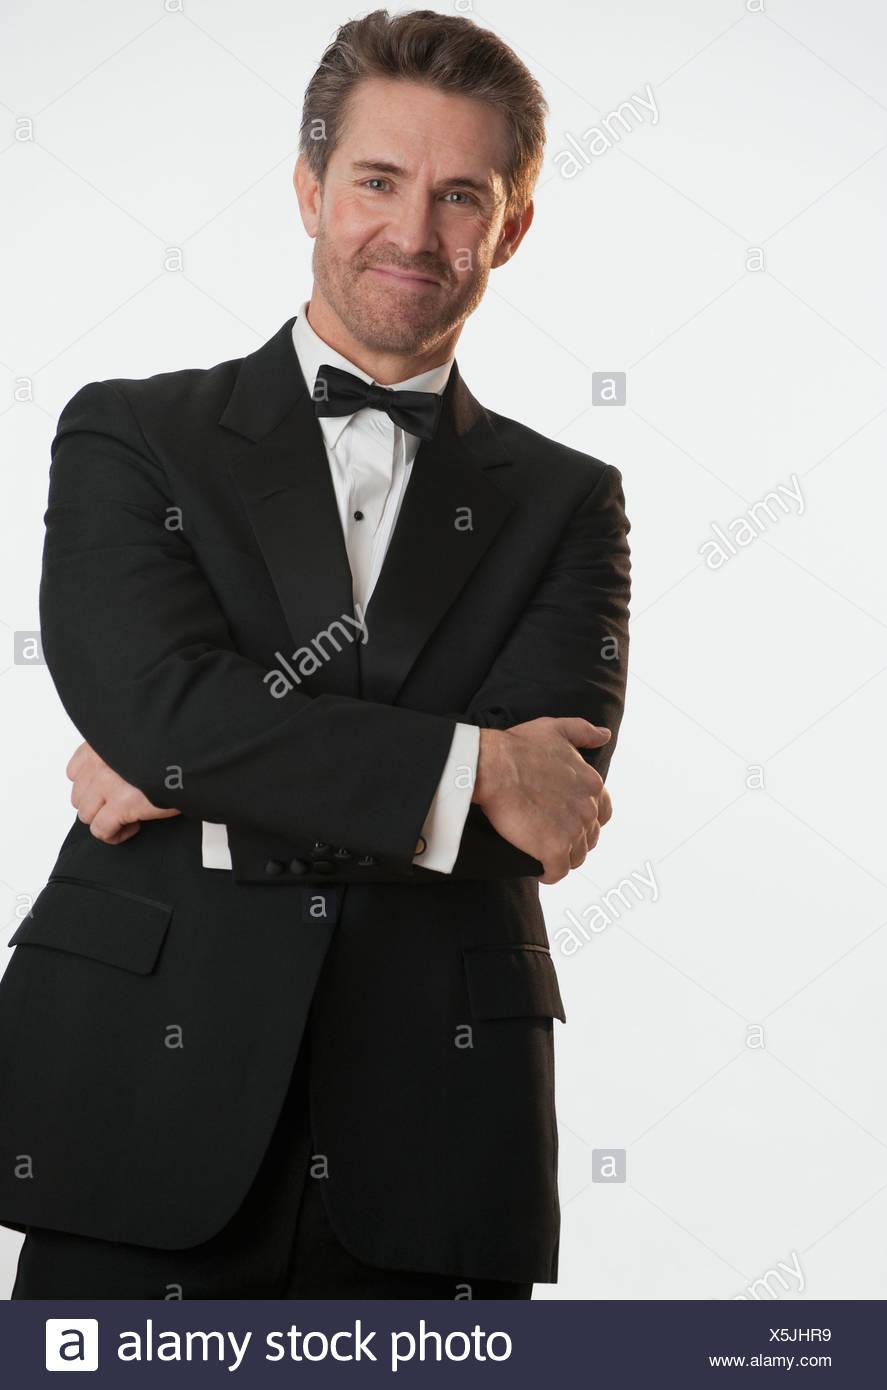 Man in tuxedo - Stock Image